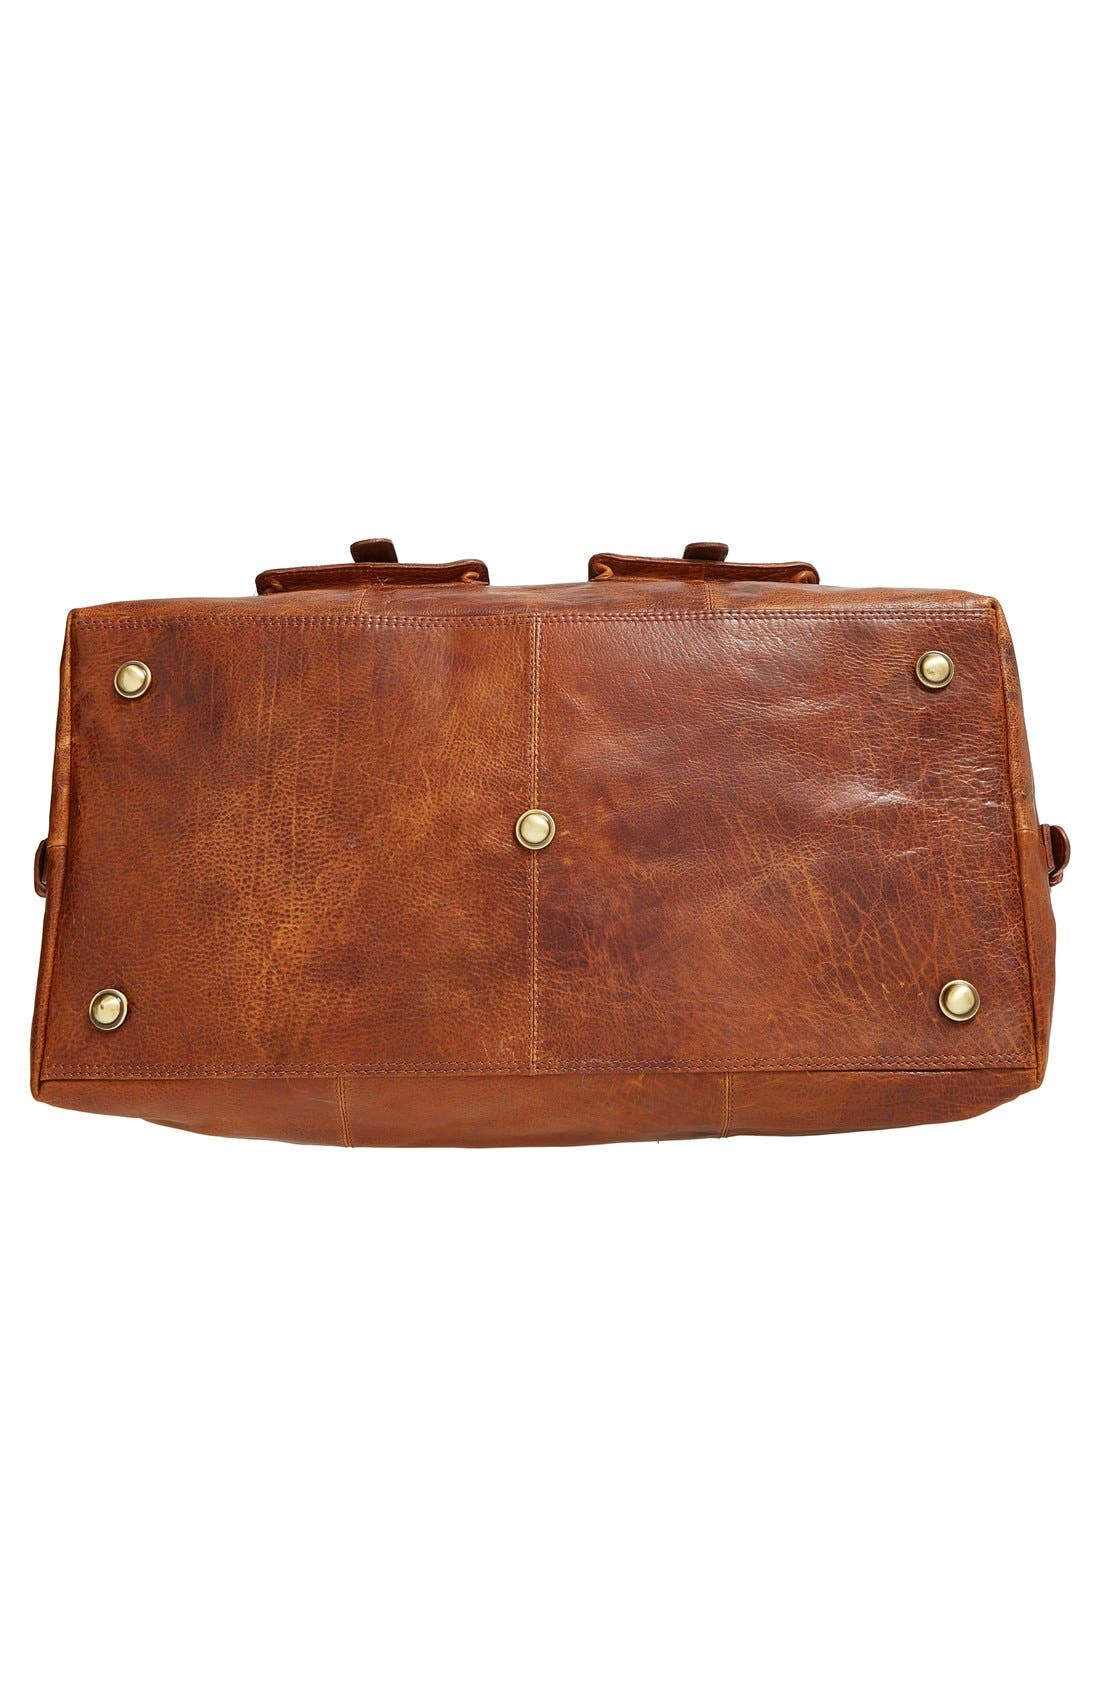 'Rugged' Leather Duffel Bag,                             Alternate thumbnail 3, color,                             COGNAC